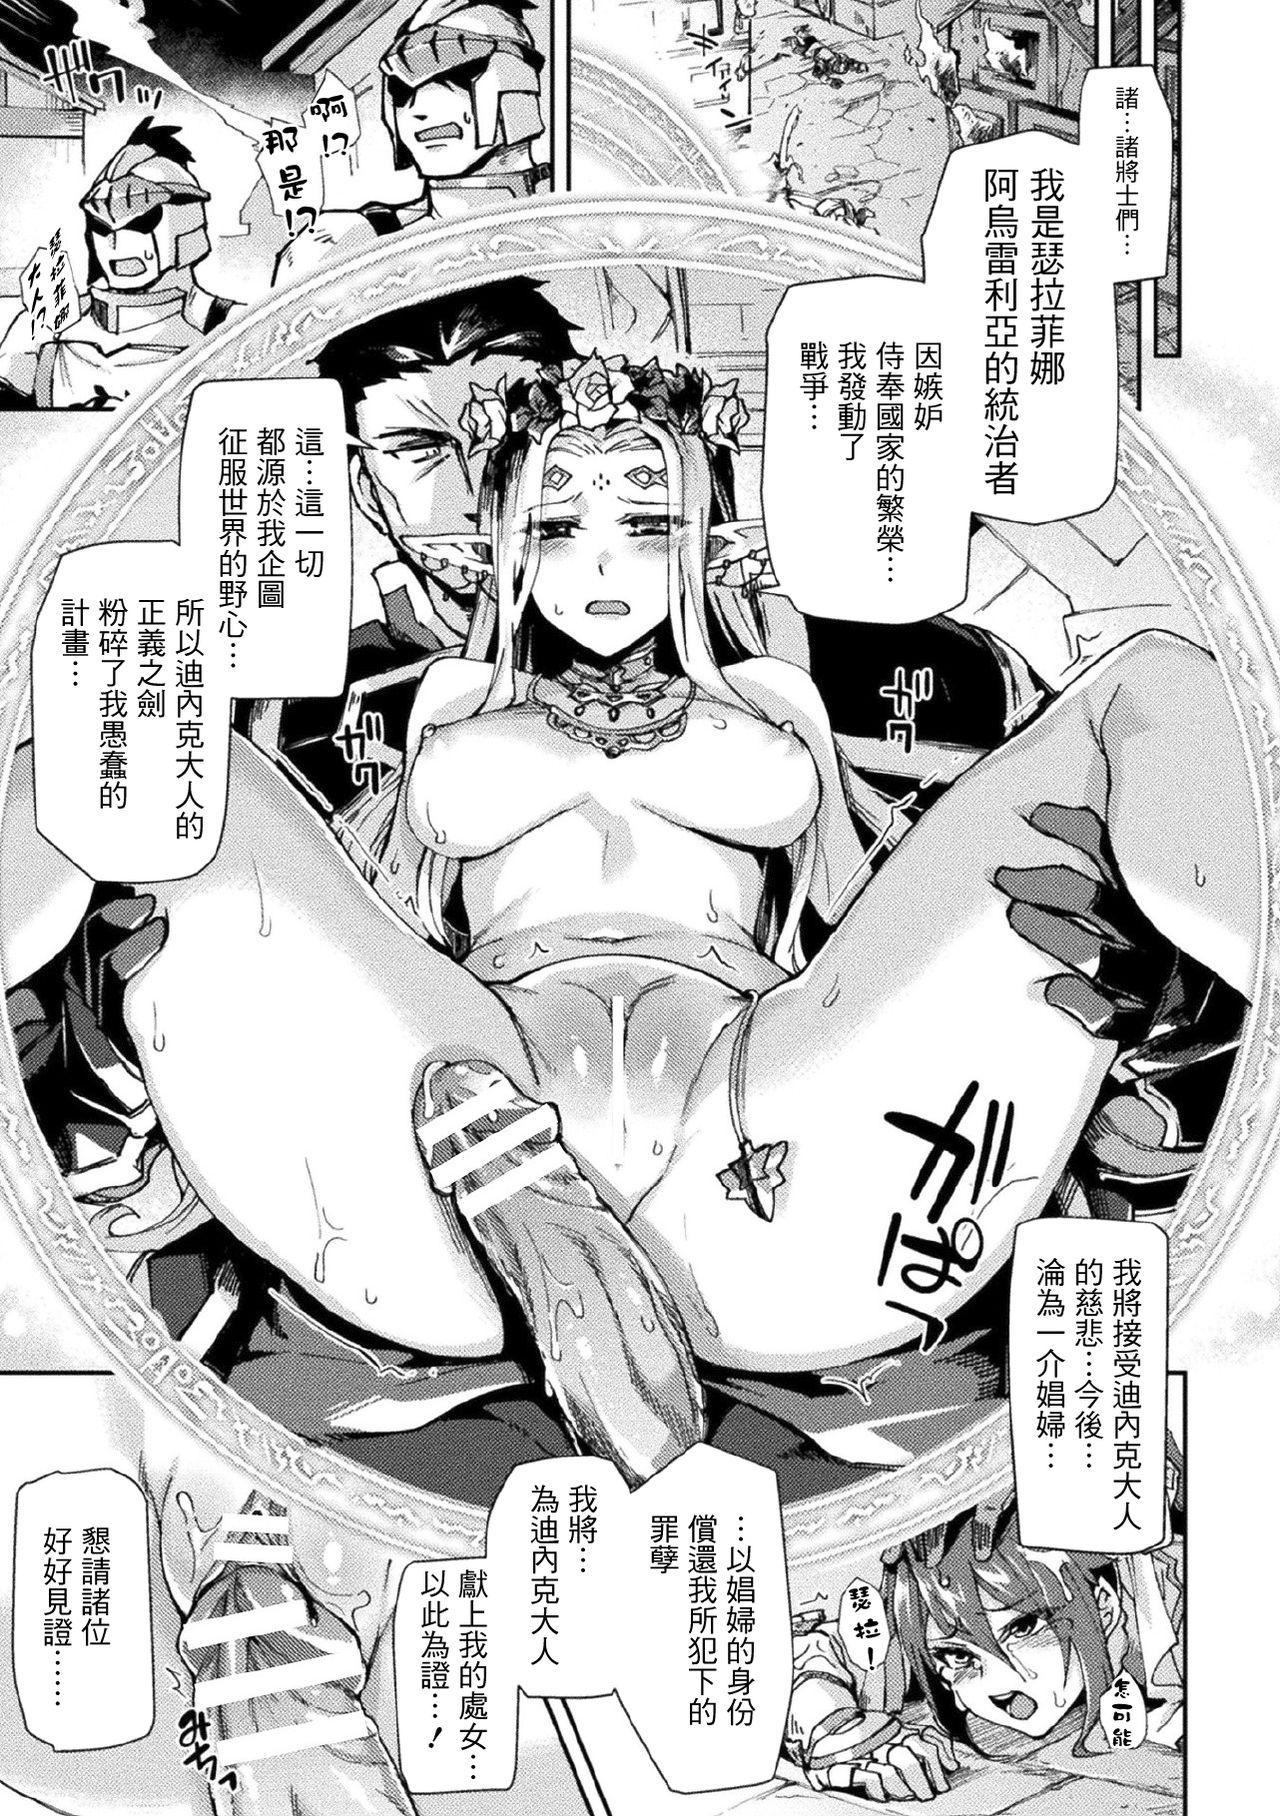 [Tsukitokage] Kuroinu II ~Inyoku ni Somaru Haitoku no Miyako, Futatabi~ THE COMIC Chapter 8 (Kukkoro Heroines Vol. 11) [Digital] [Chinese] [鬼畜王漢化組] [Digital] 3